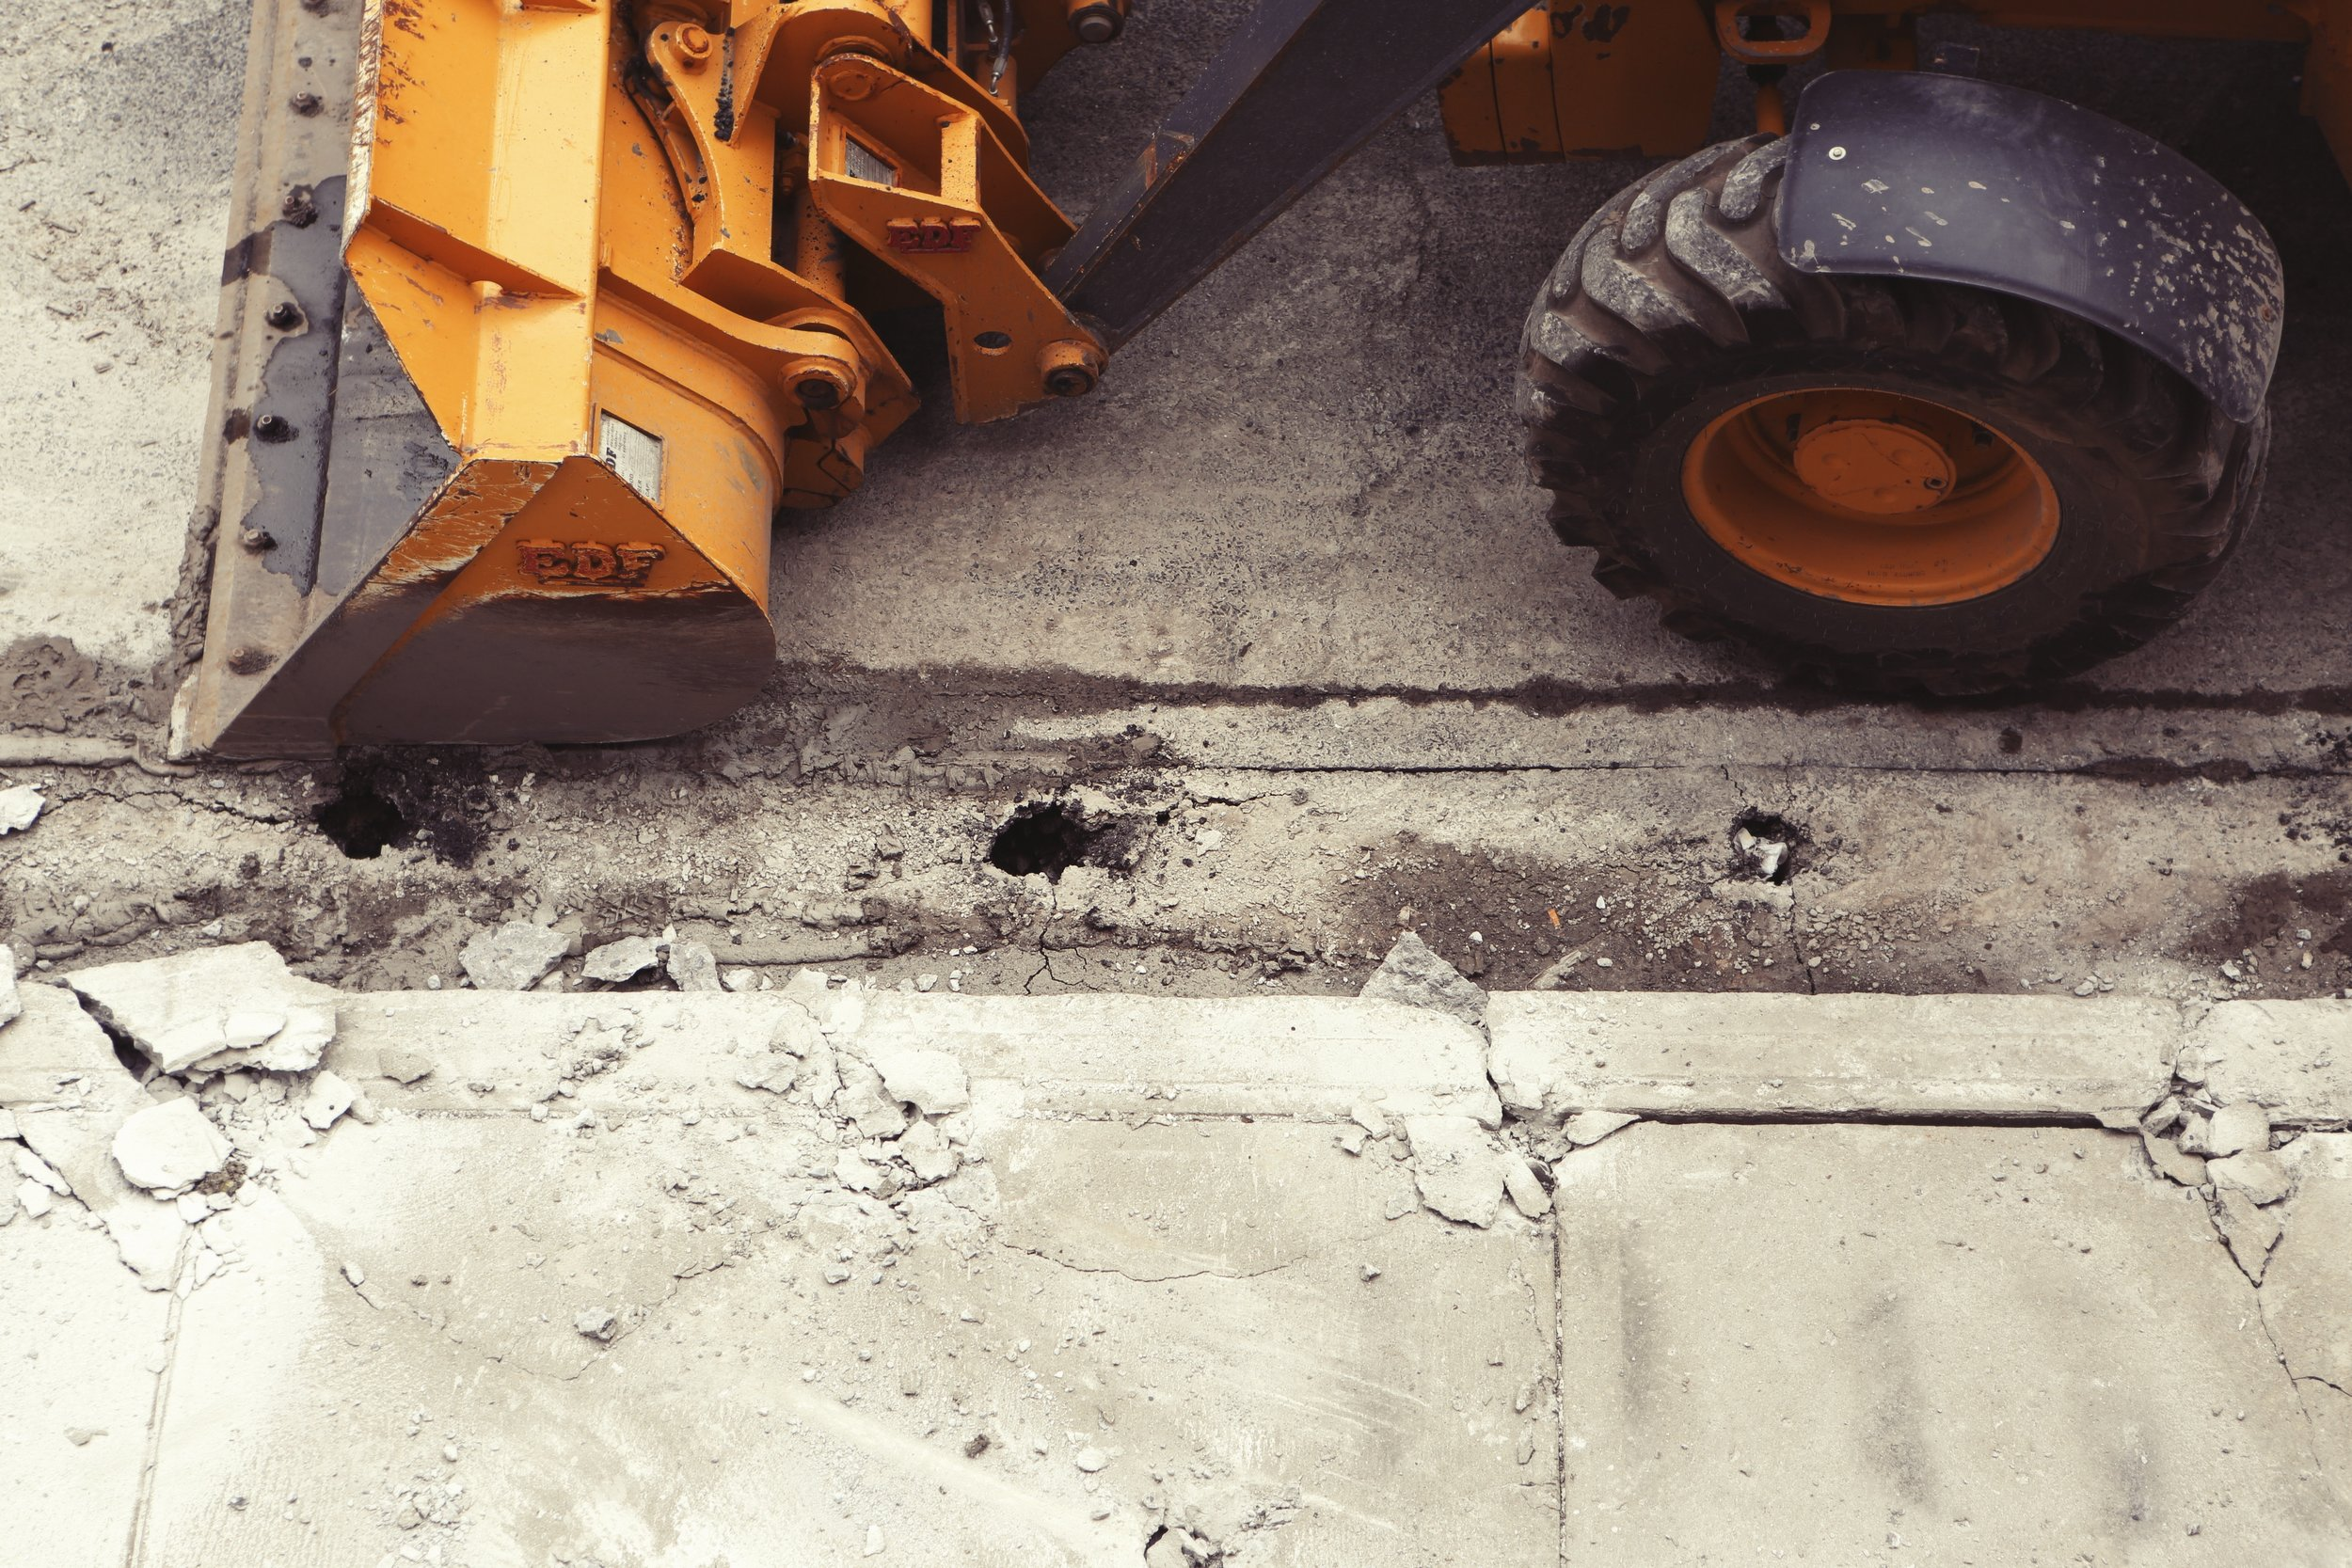 bagger-constructing-construction-2489.jpg